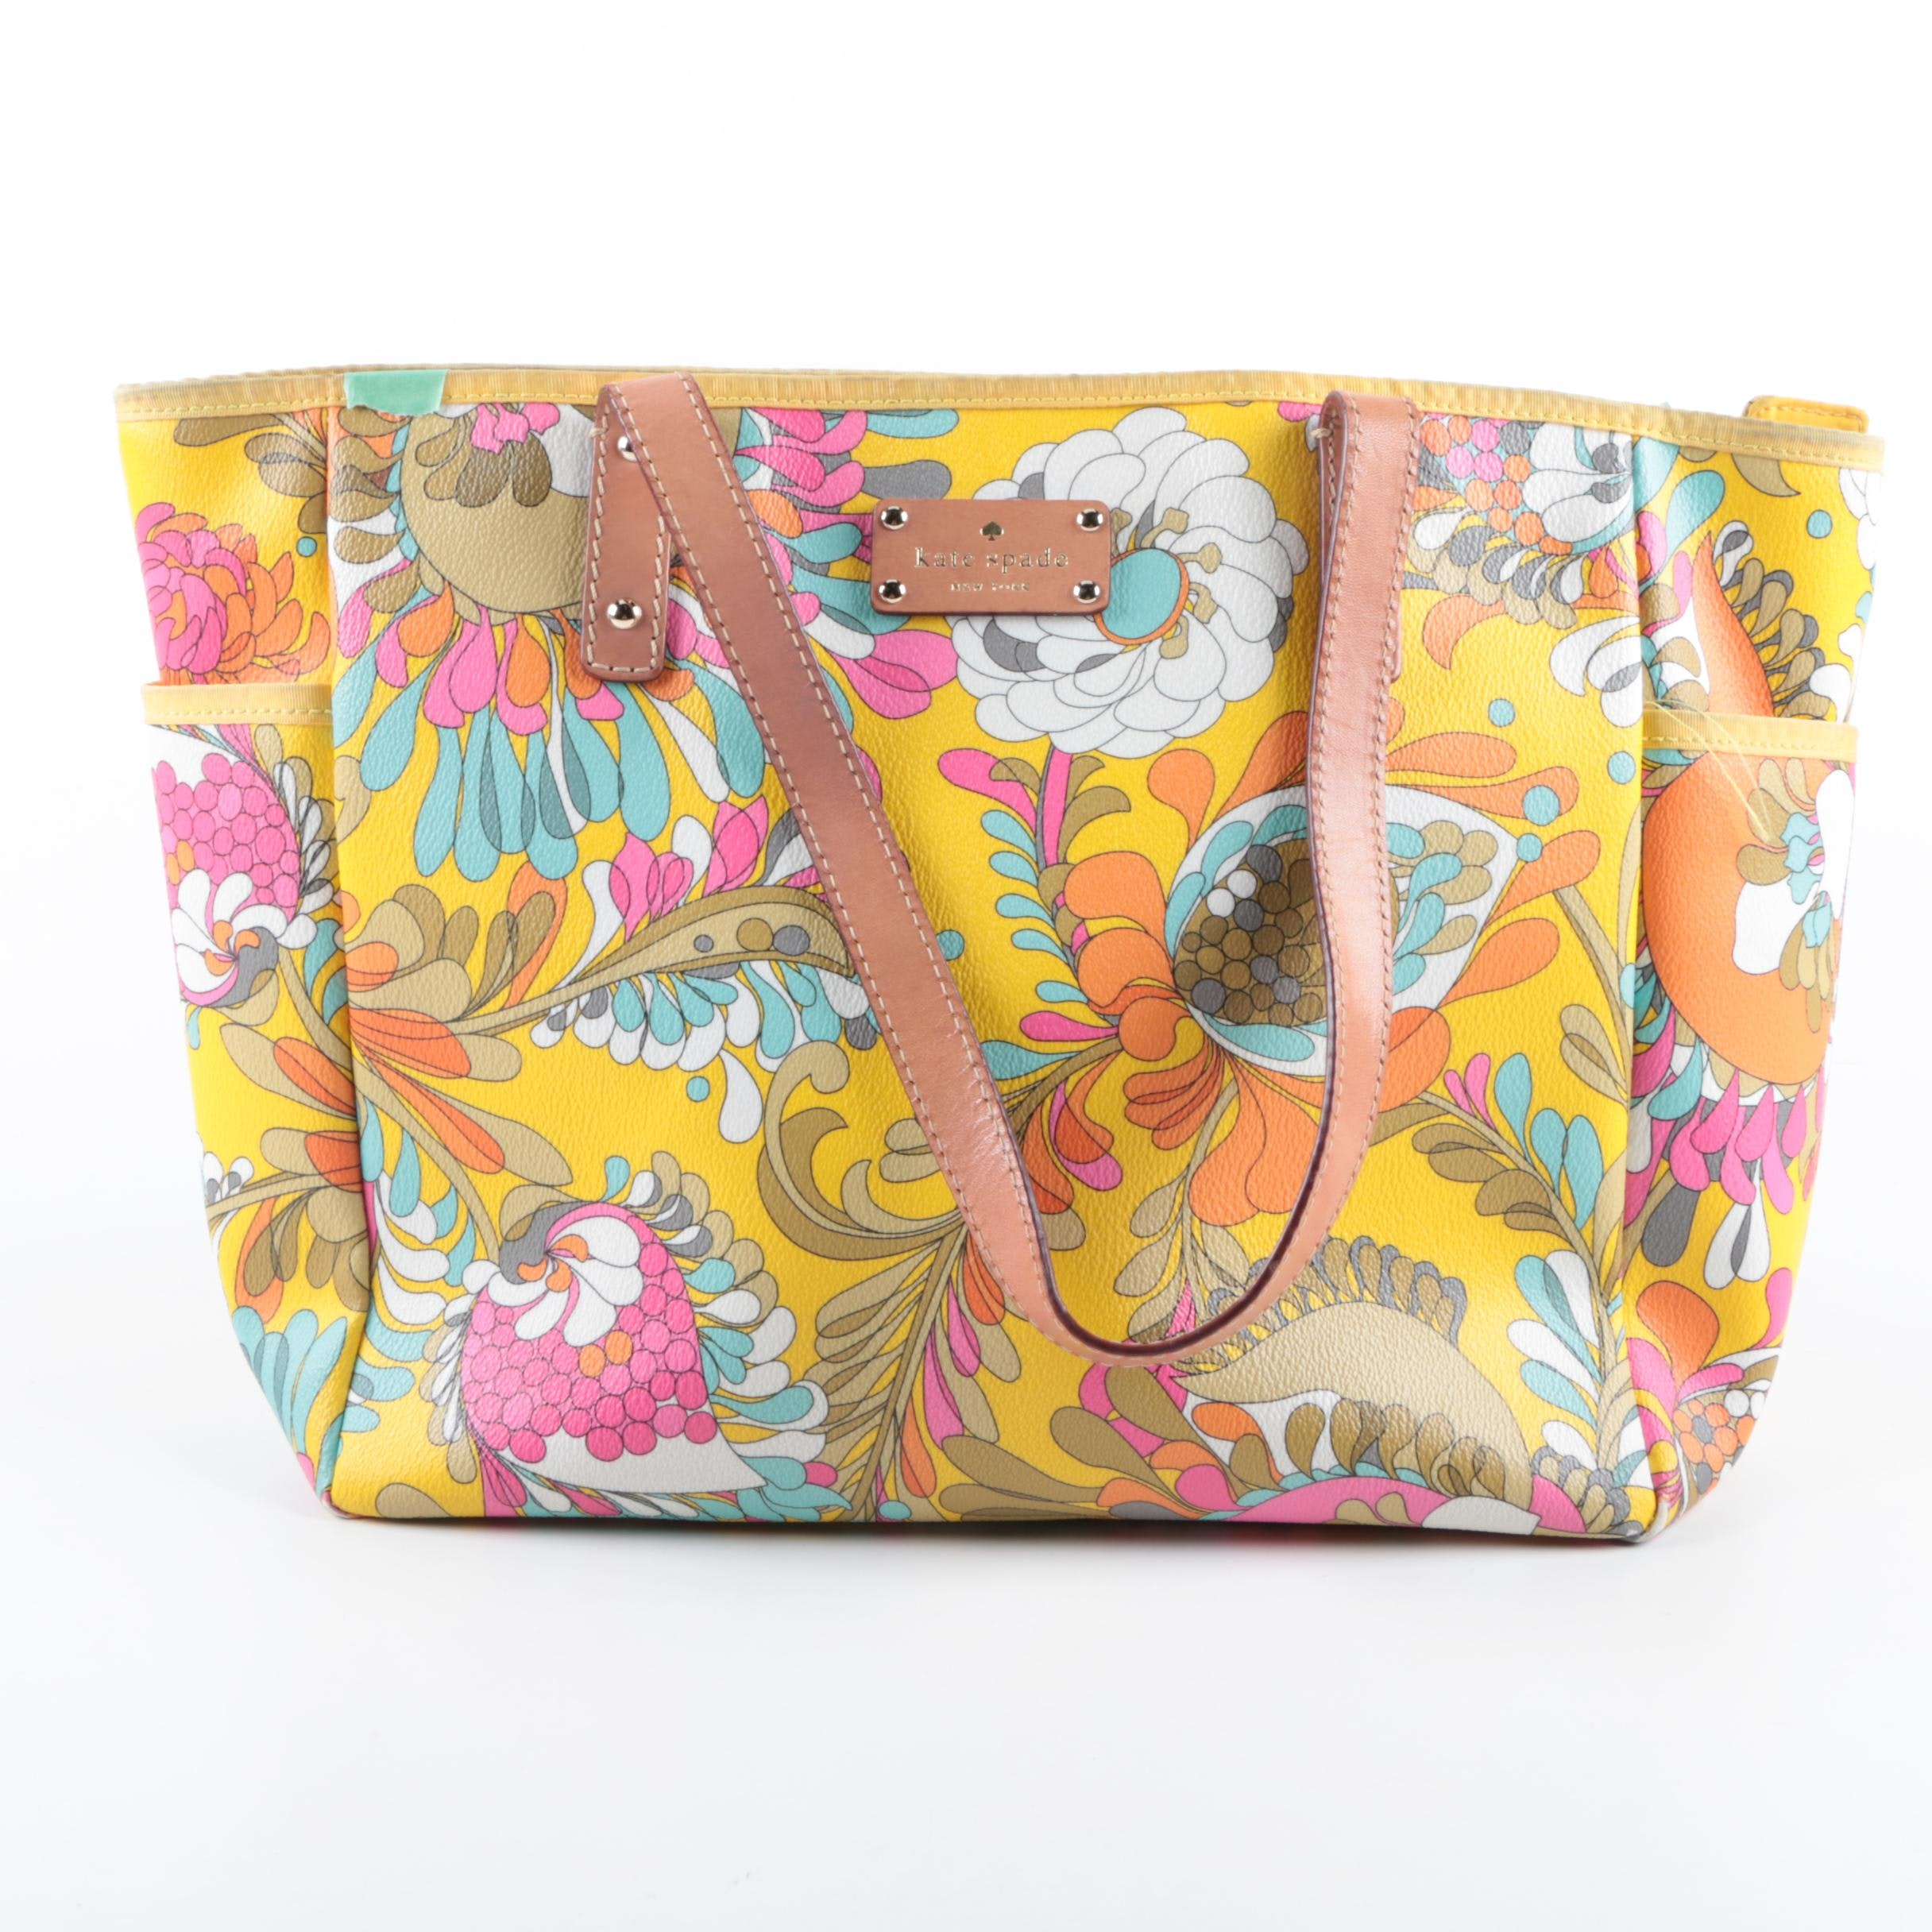 Kate Spade Sydney Paley Paisley Tote Handbag